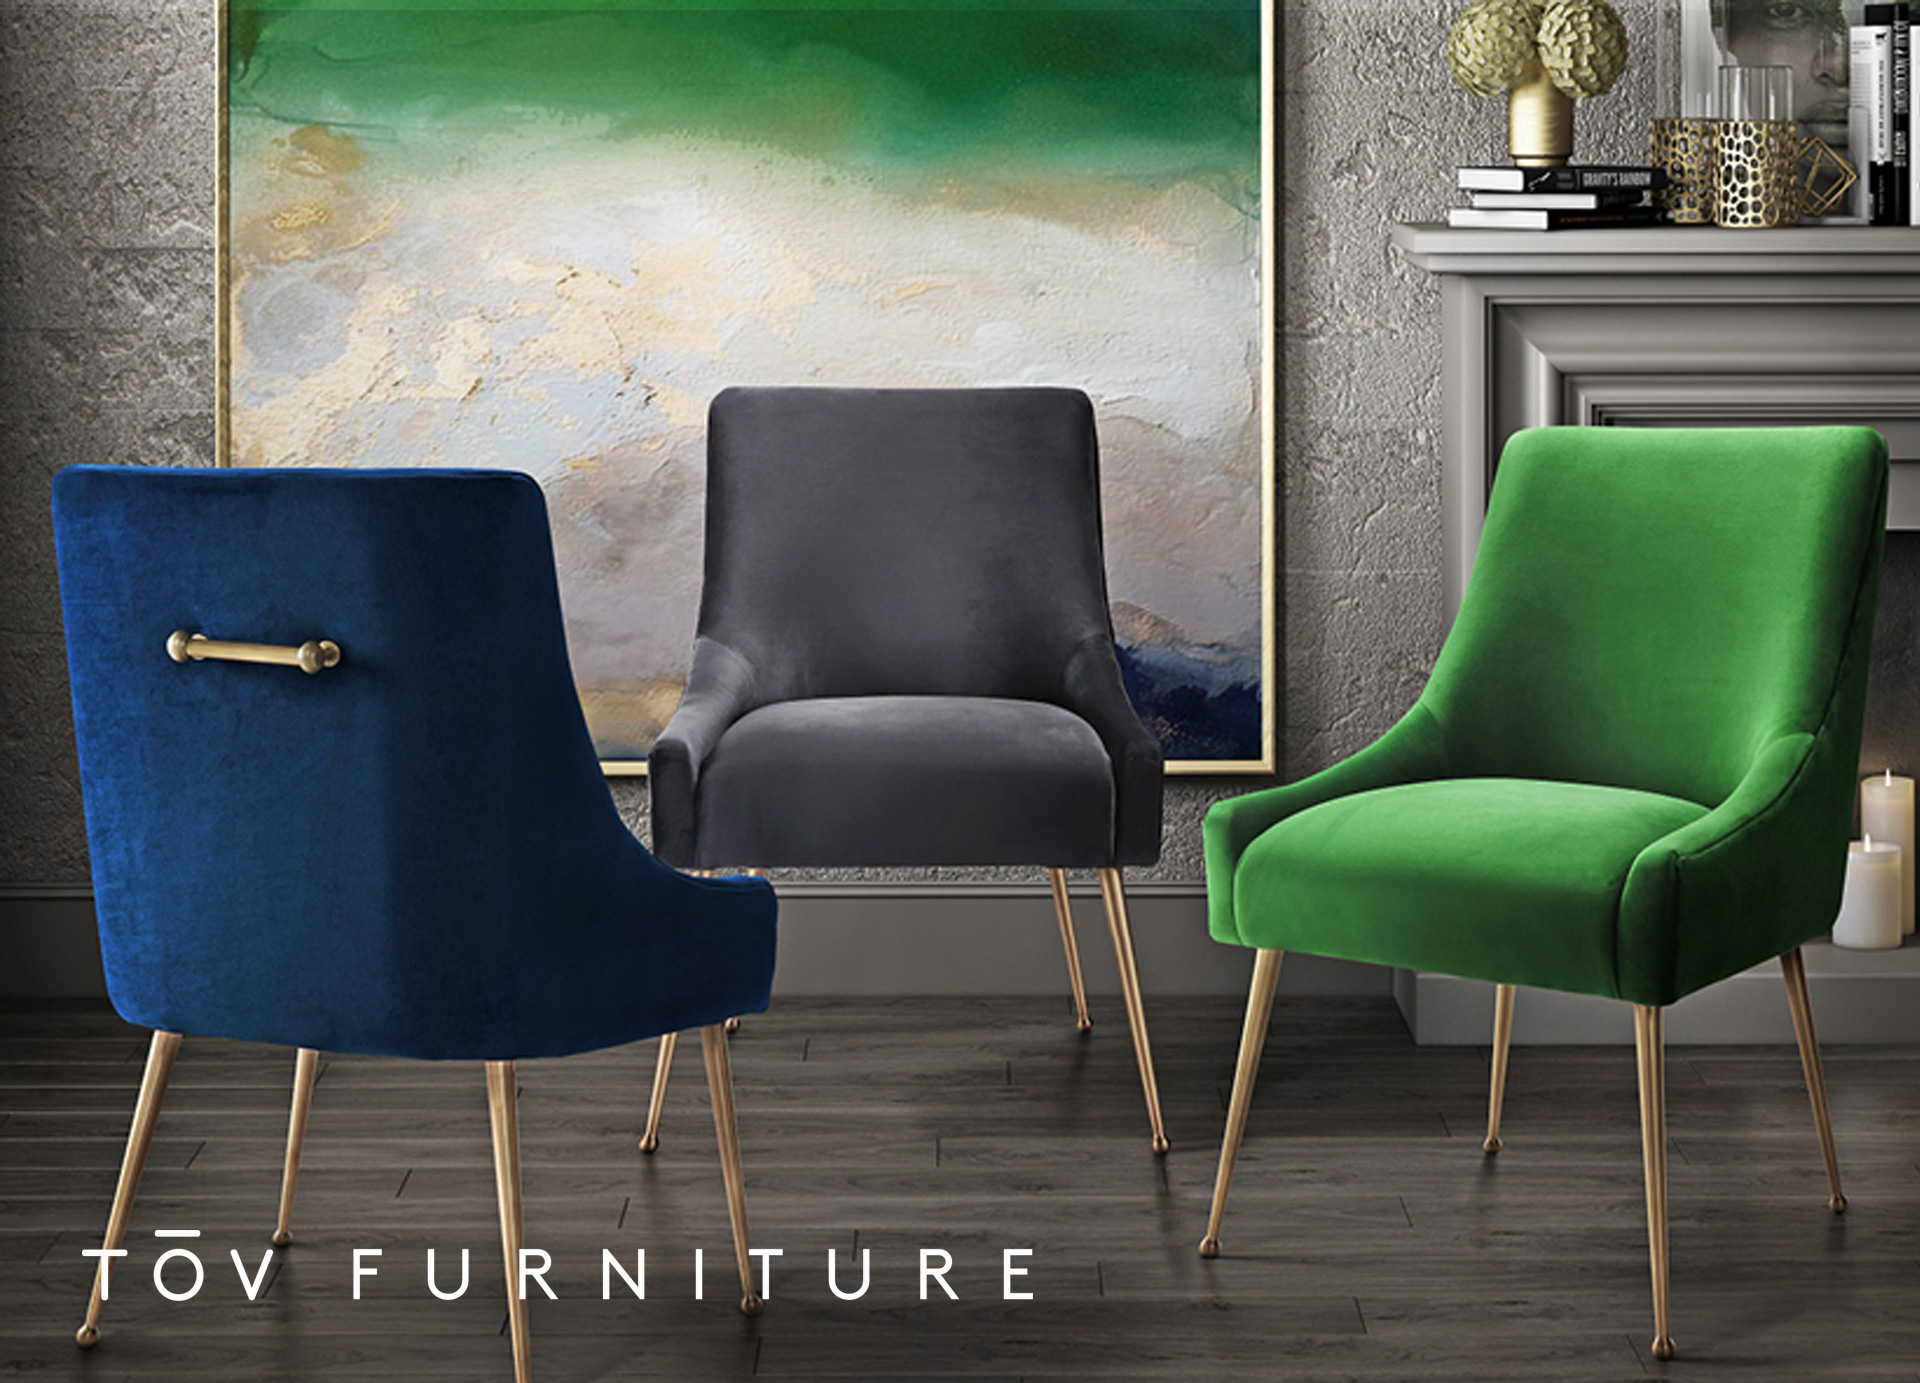 central-florida-fine-interiors-showroom-TOV-furniture